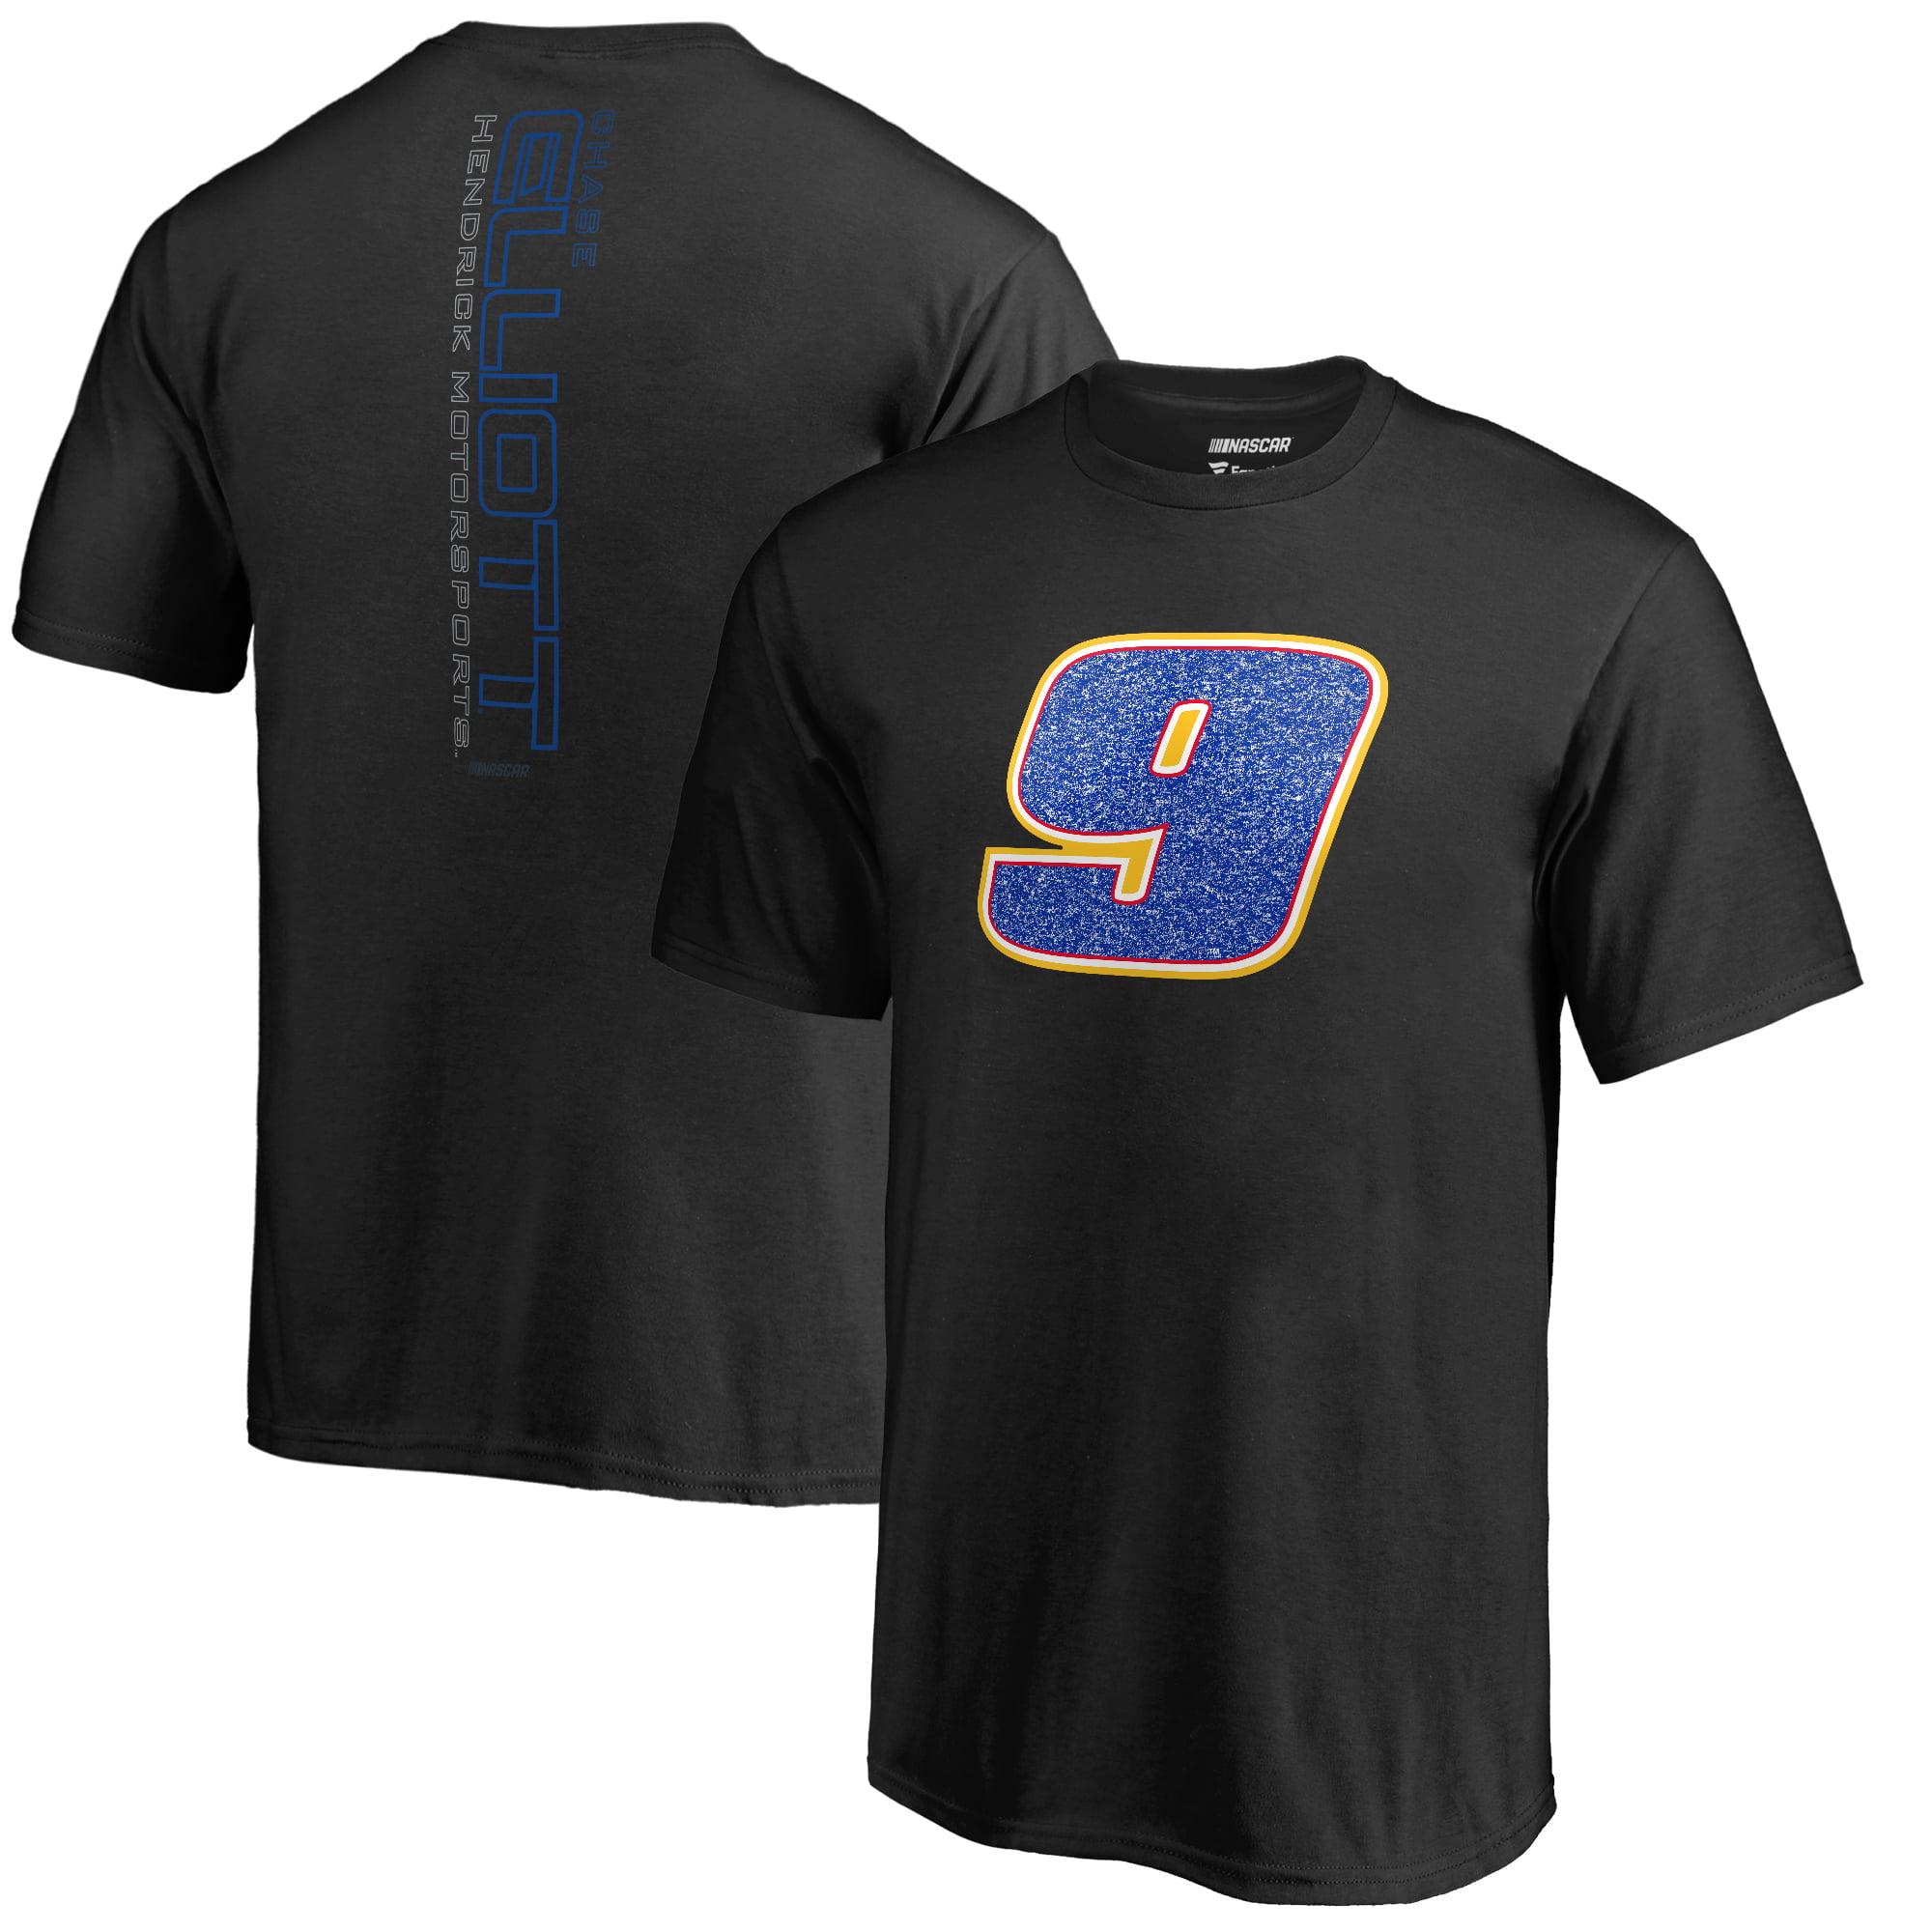 Chase Elliott Fanatics Branded Youth Static T-Shirt - Black